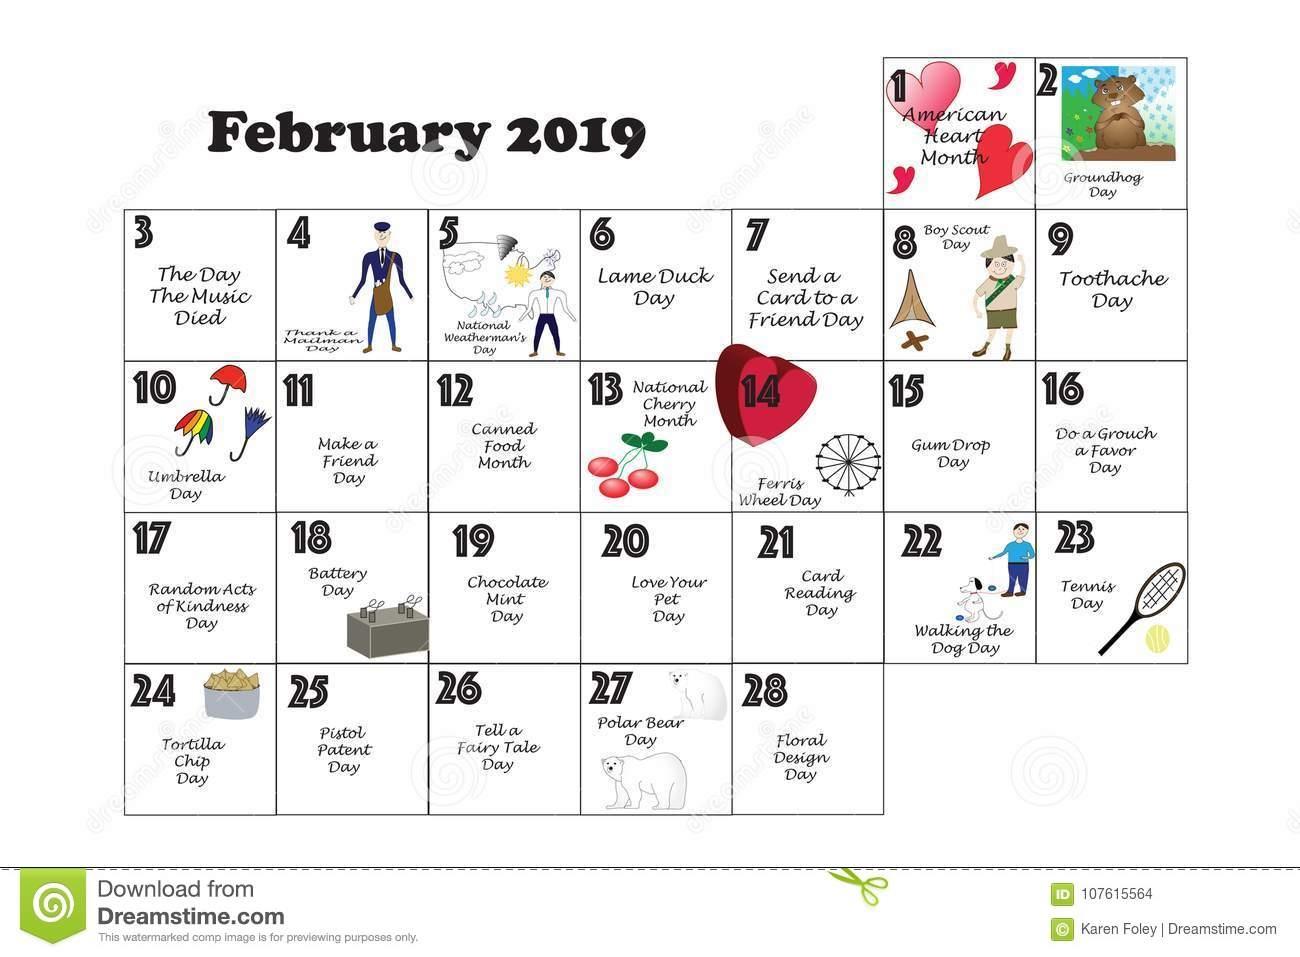 February 2019 Calendar Of Events